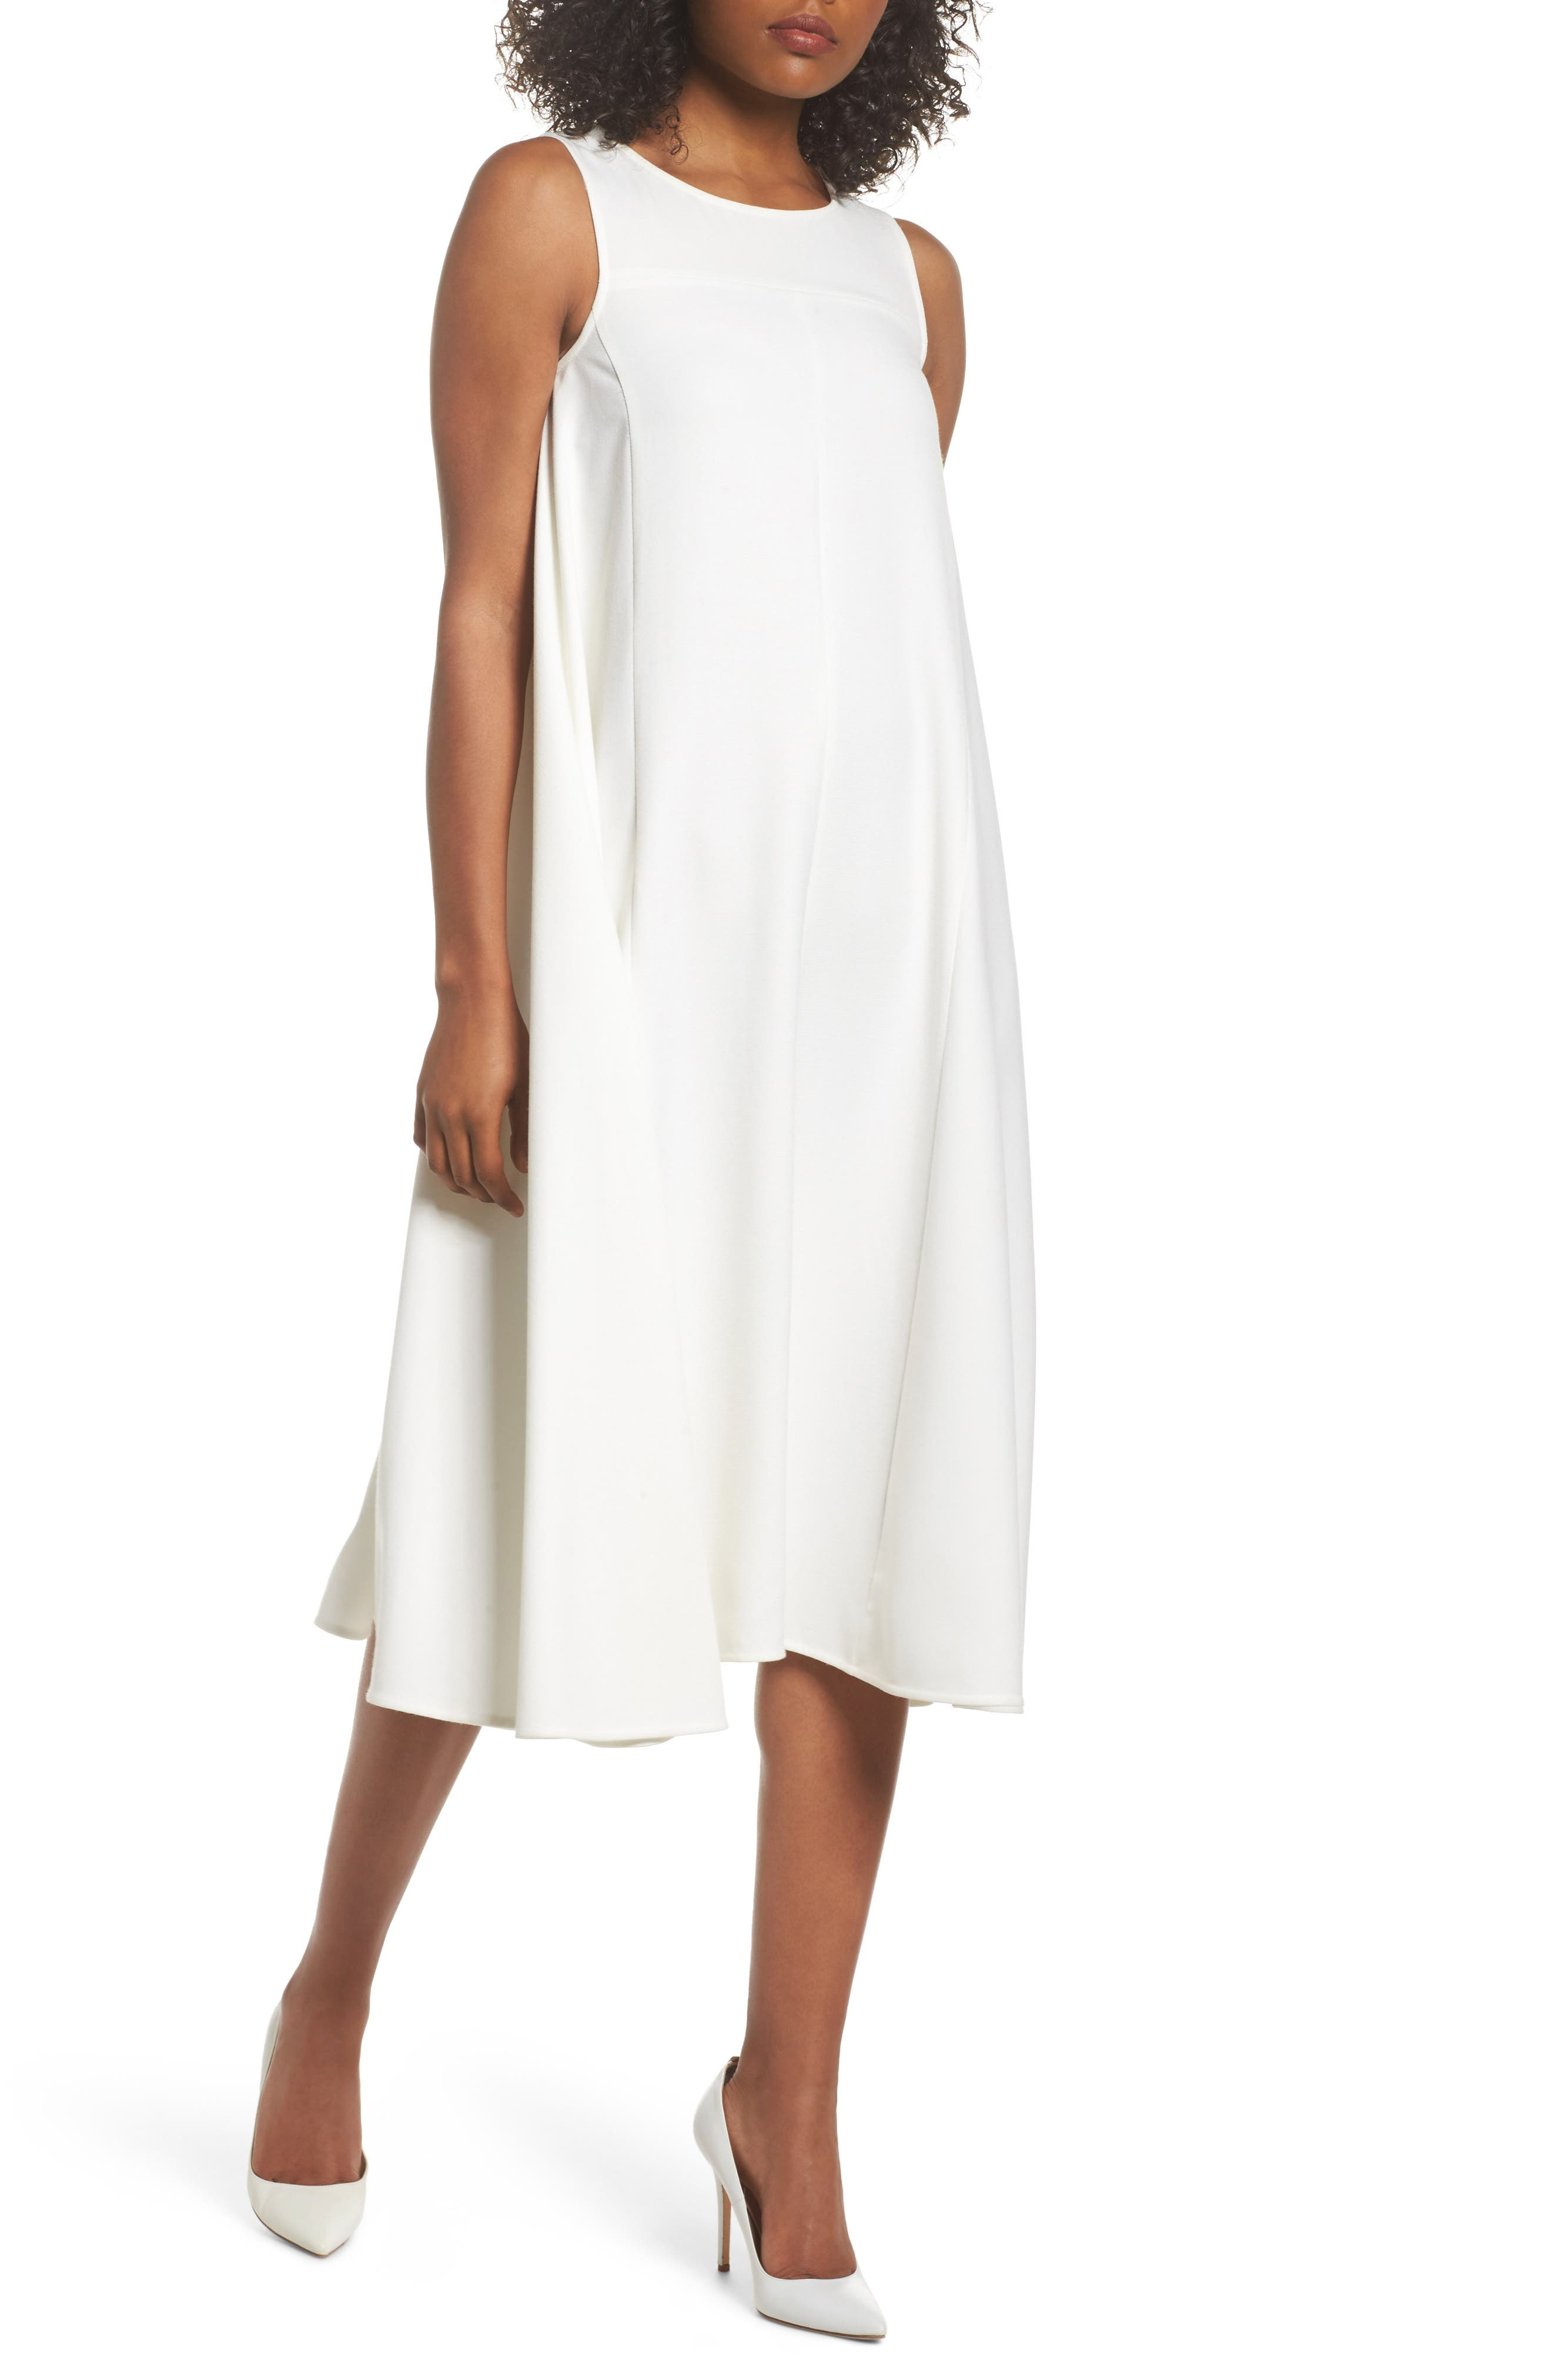 CAARA Sunday Brunch Sleeveless Midi Dress